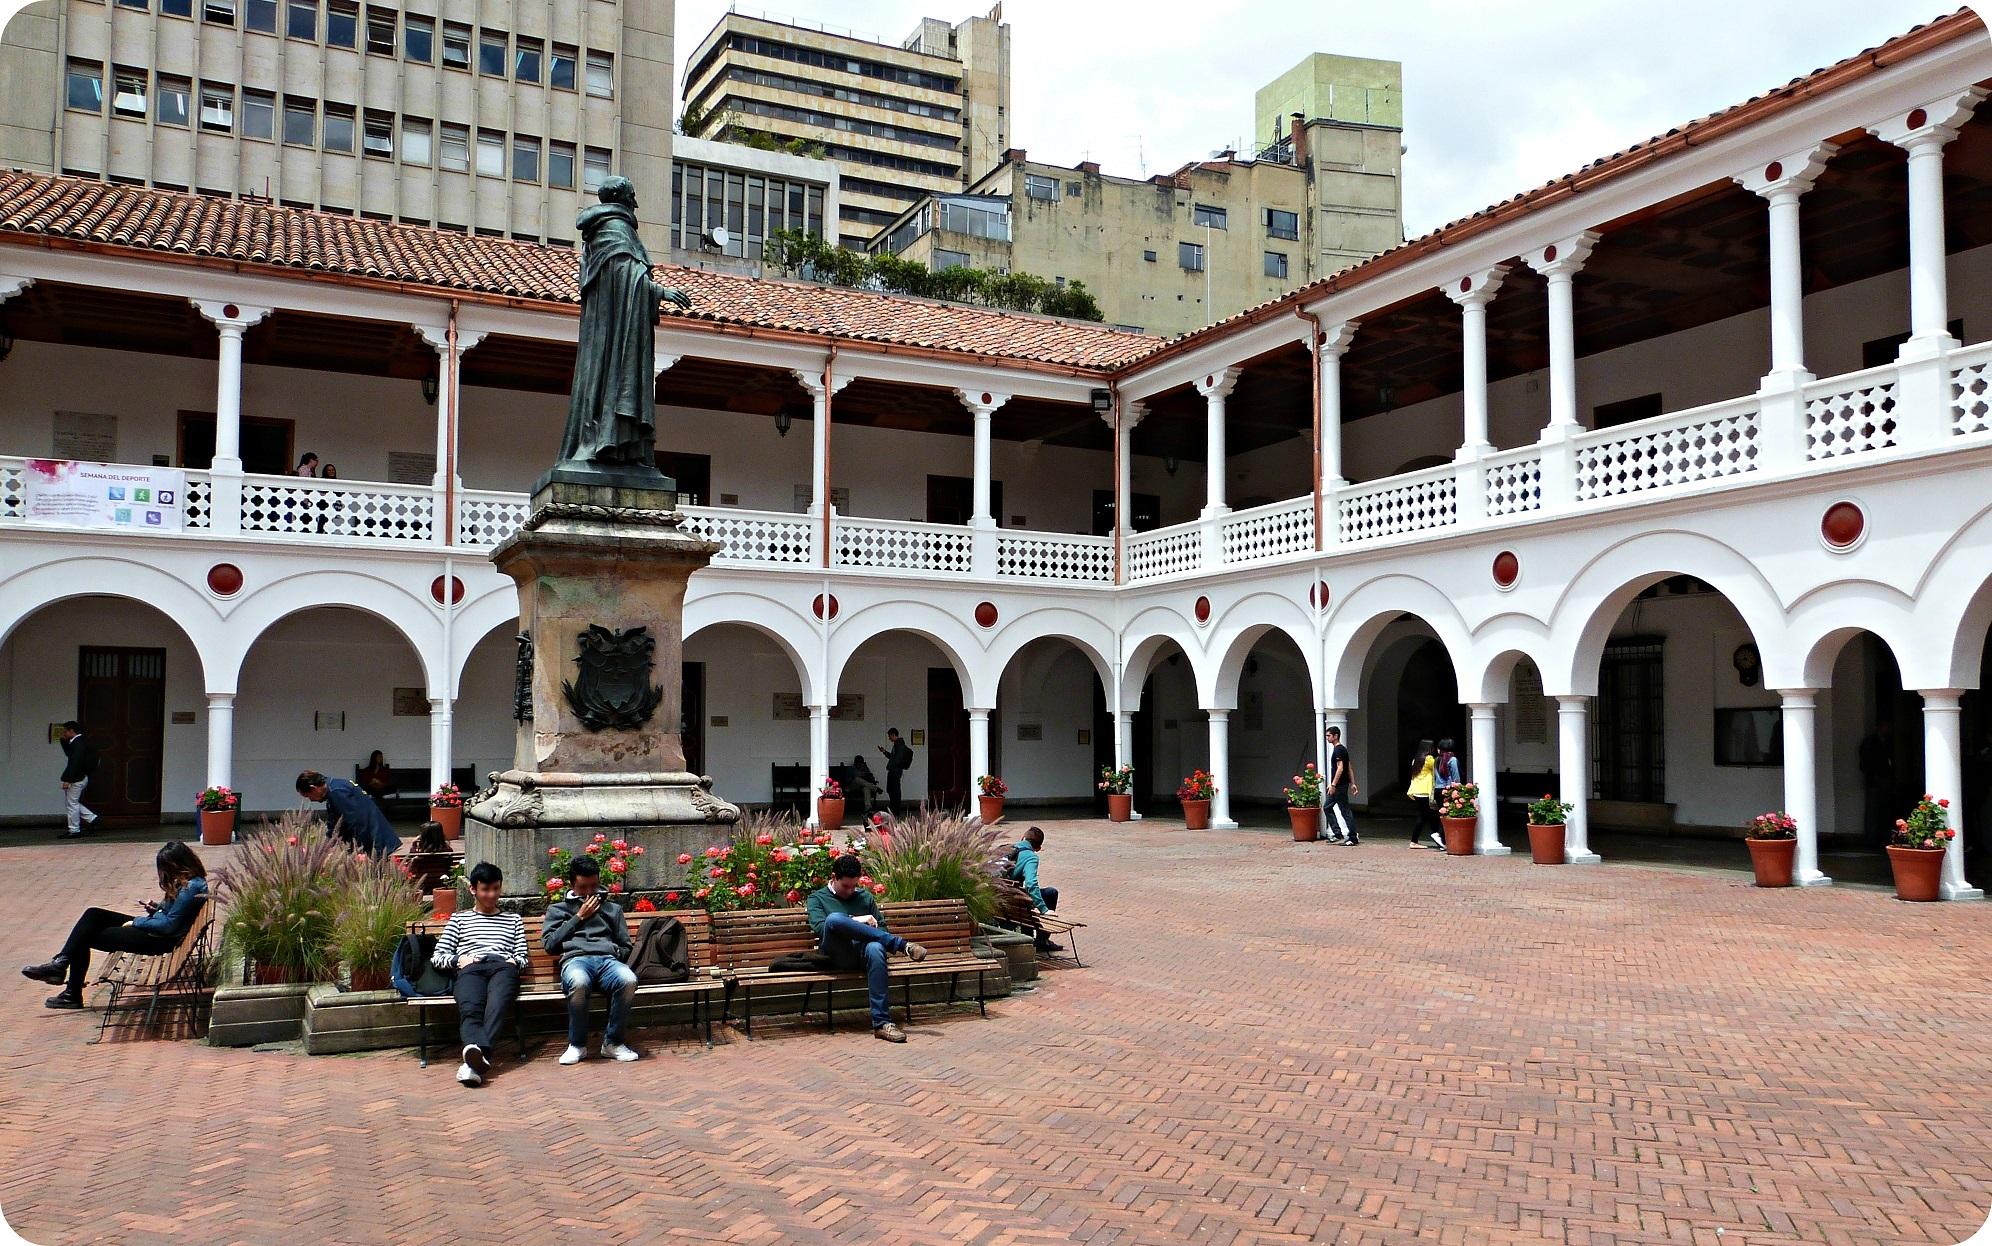 Patio de l'université del Rosario de Bogotá